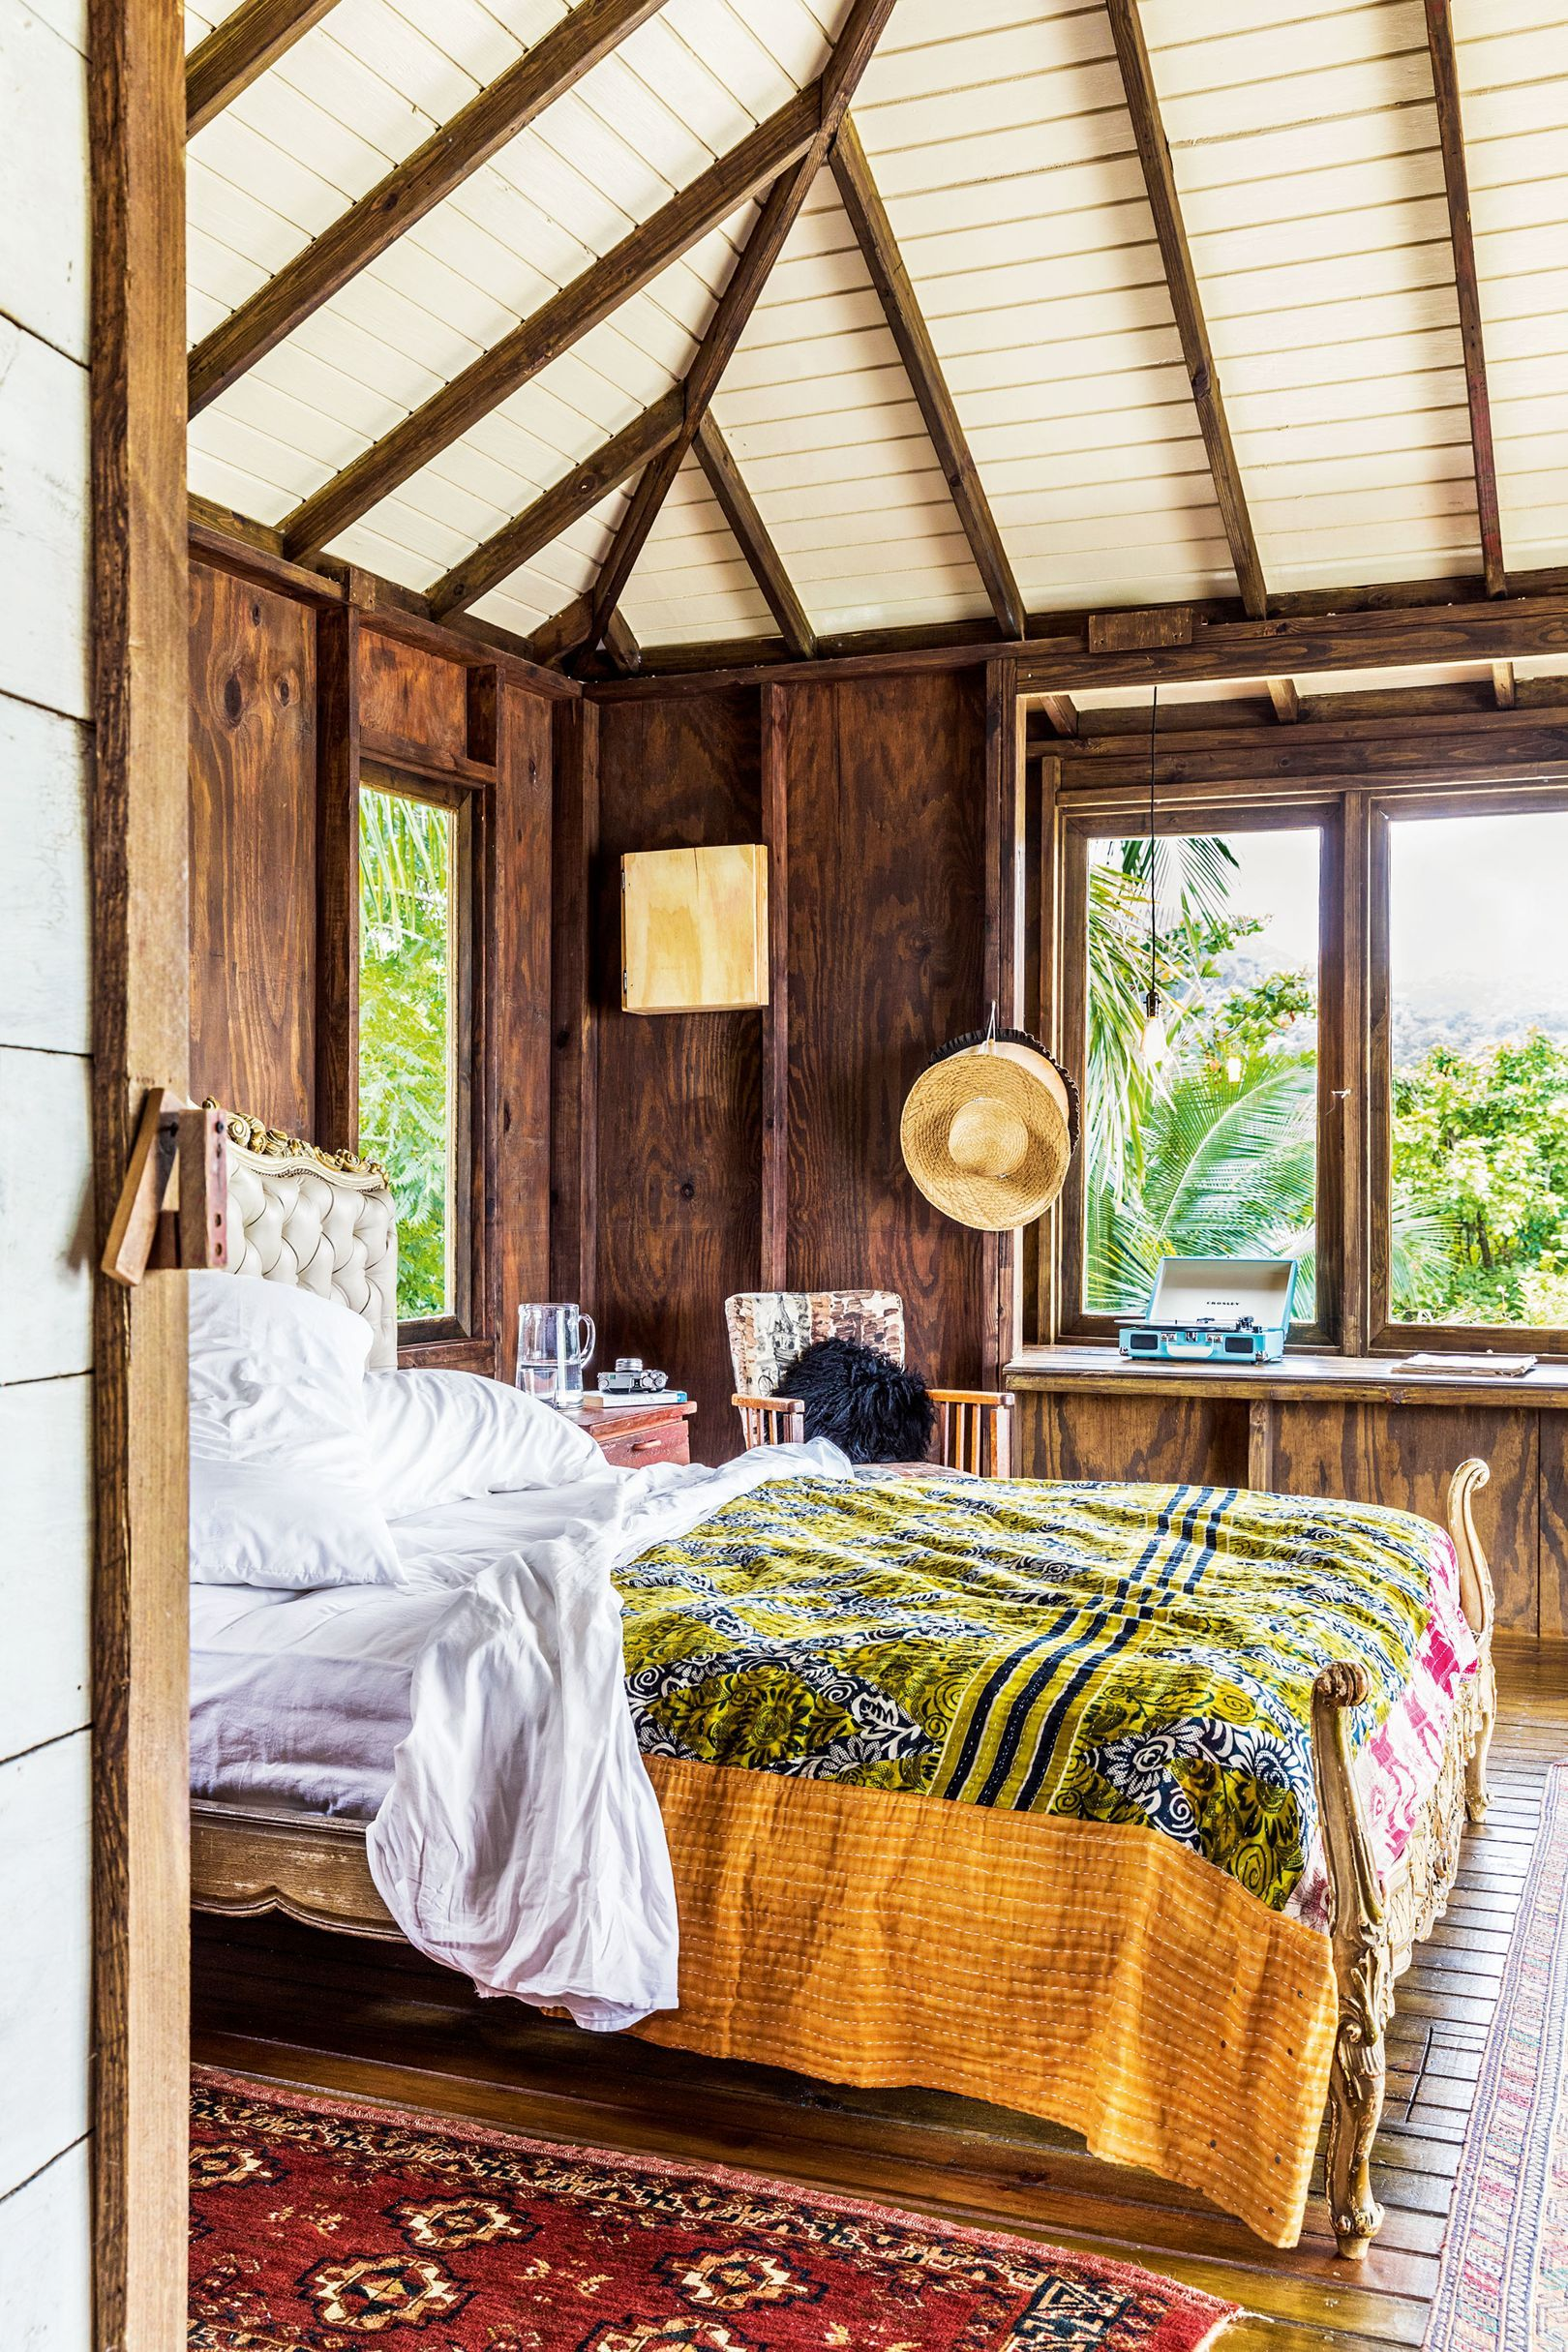 Romantic Hotel Room Ideas: 137 Astoundingly Beautiful And Romantic Hotel Rooms